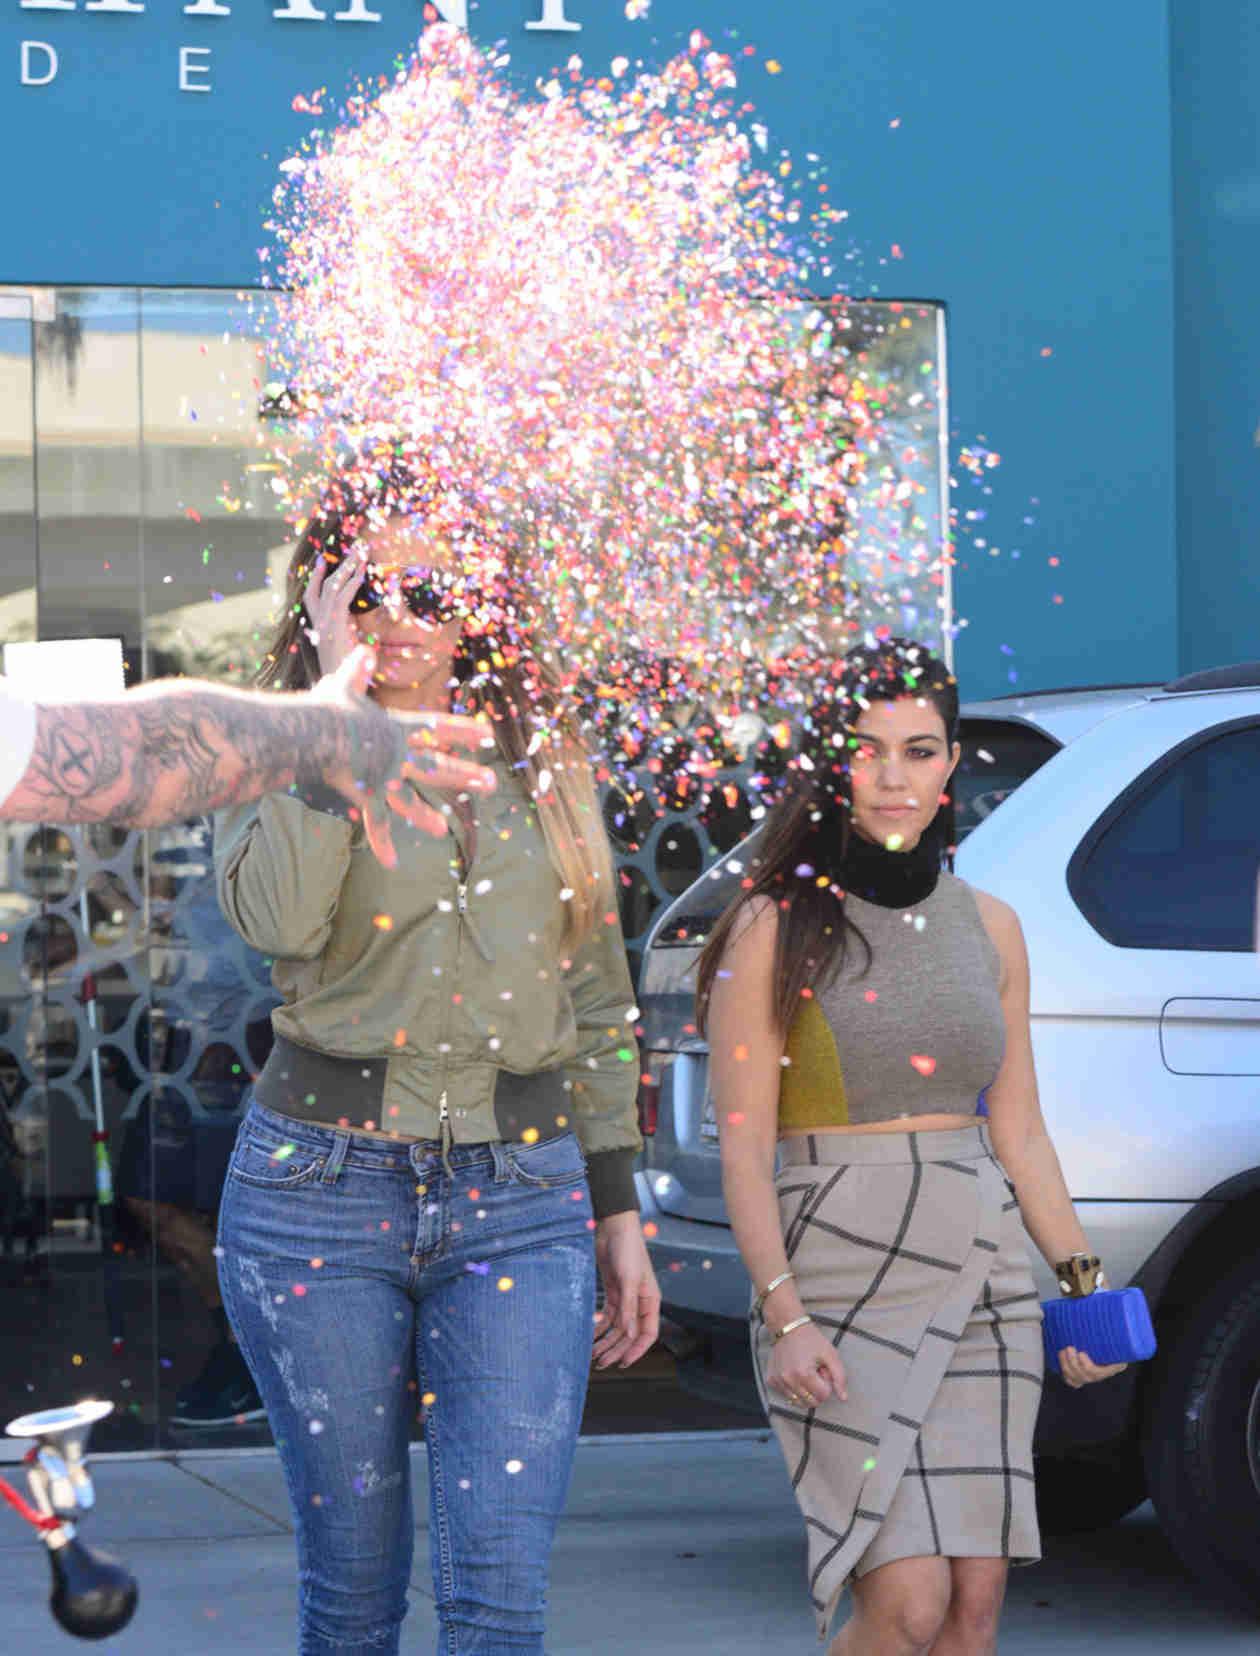 Khloe and Kourtney Kardashian Get Ambushed With Confetti by a Clown (PHOTO)